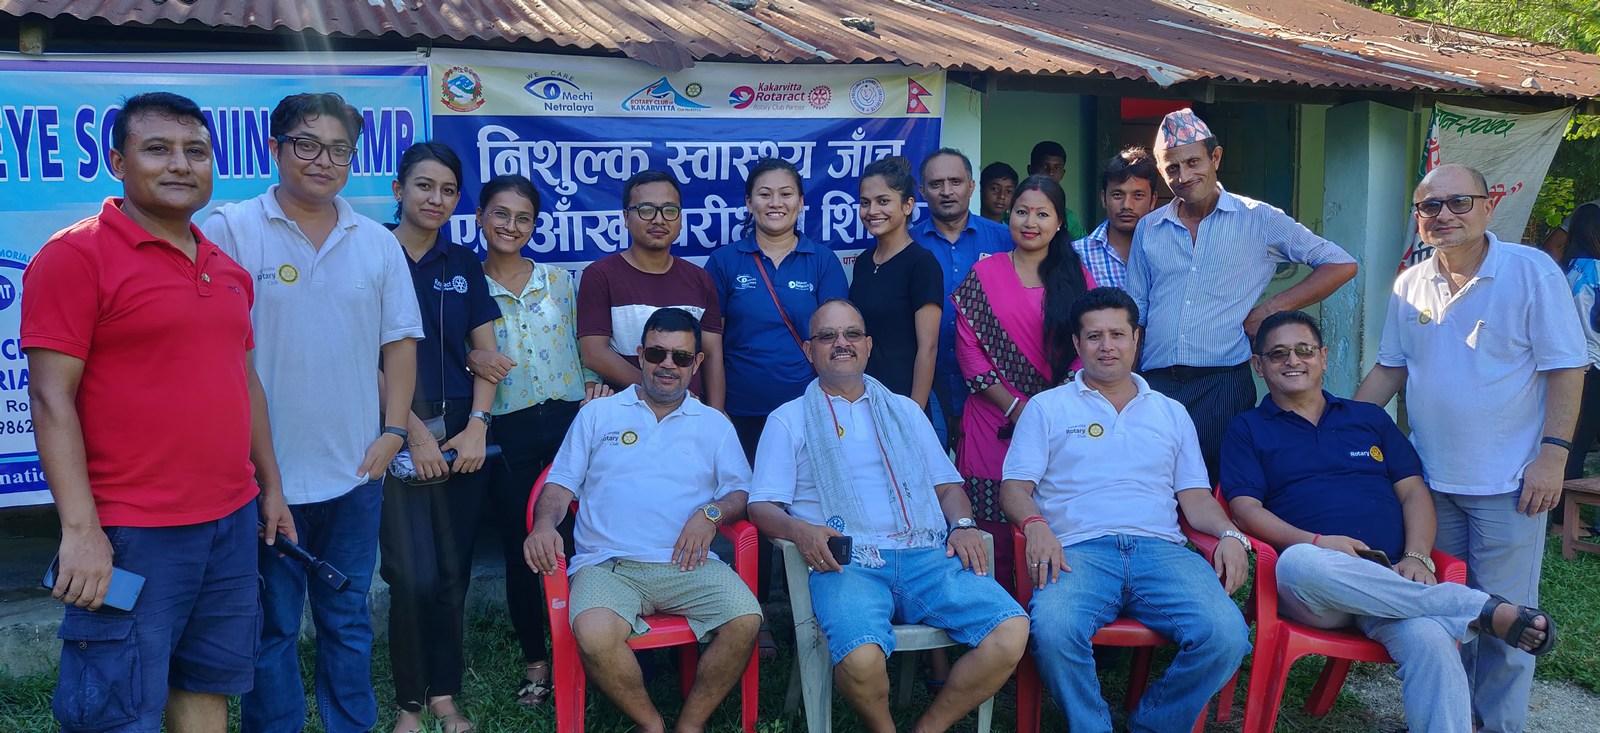 Free-Health-Camp-Eye-Screening-at-Gwala-Basti-Mechinagar-15-Jhapa-Nepal-Rotary-Club-of-Kakarvitta-46